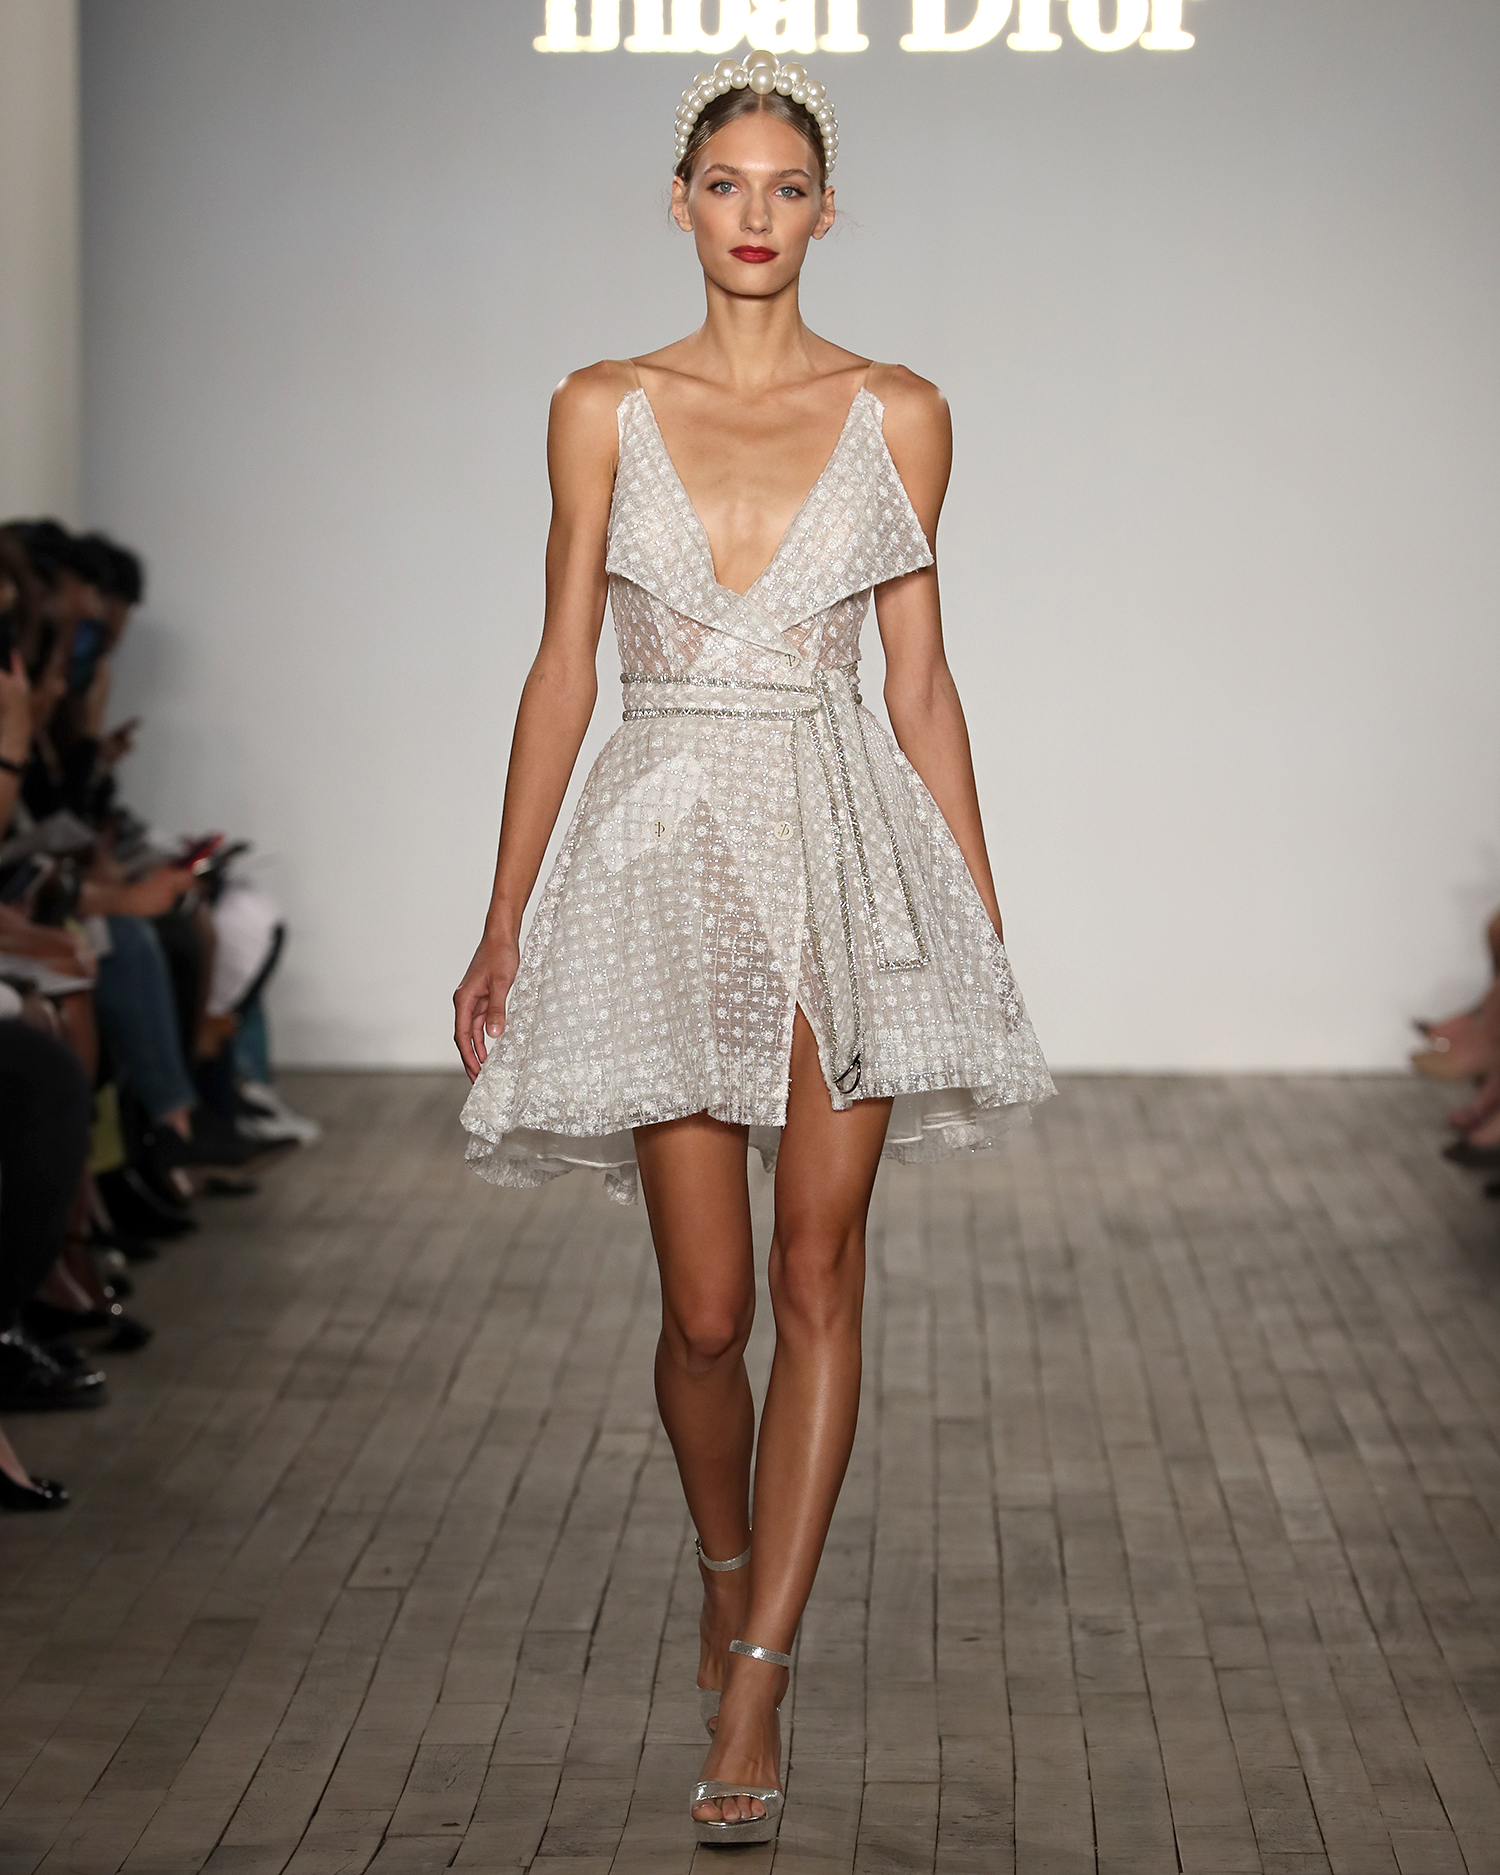 inbal dror wedding dress short collared a-line with sash